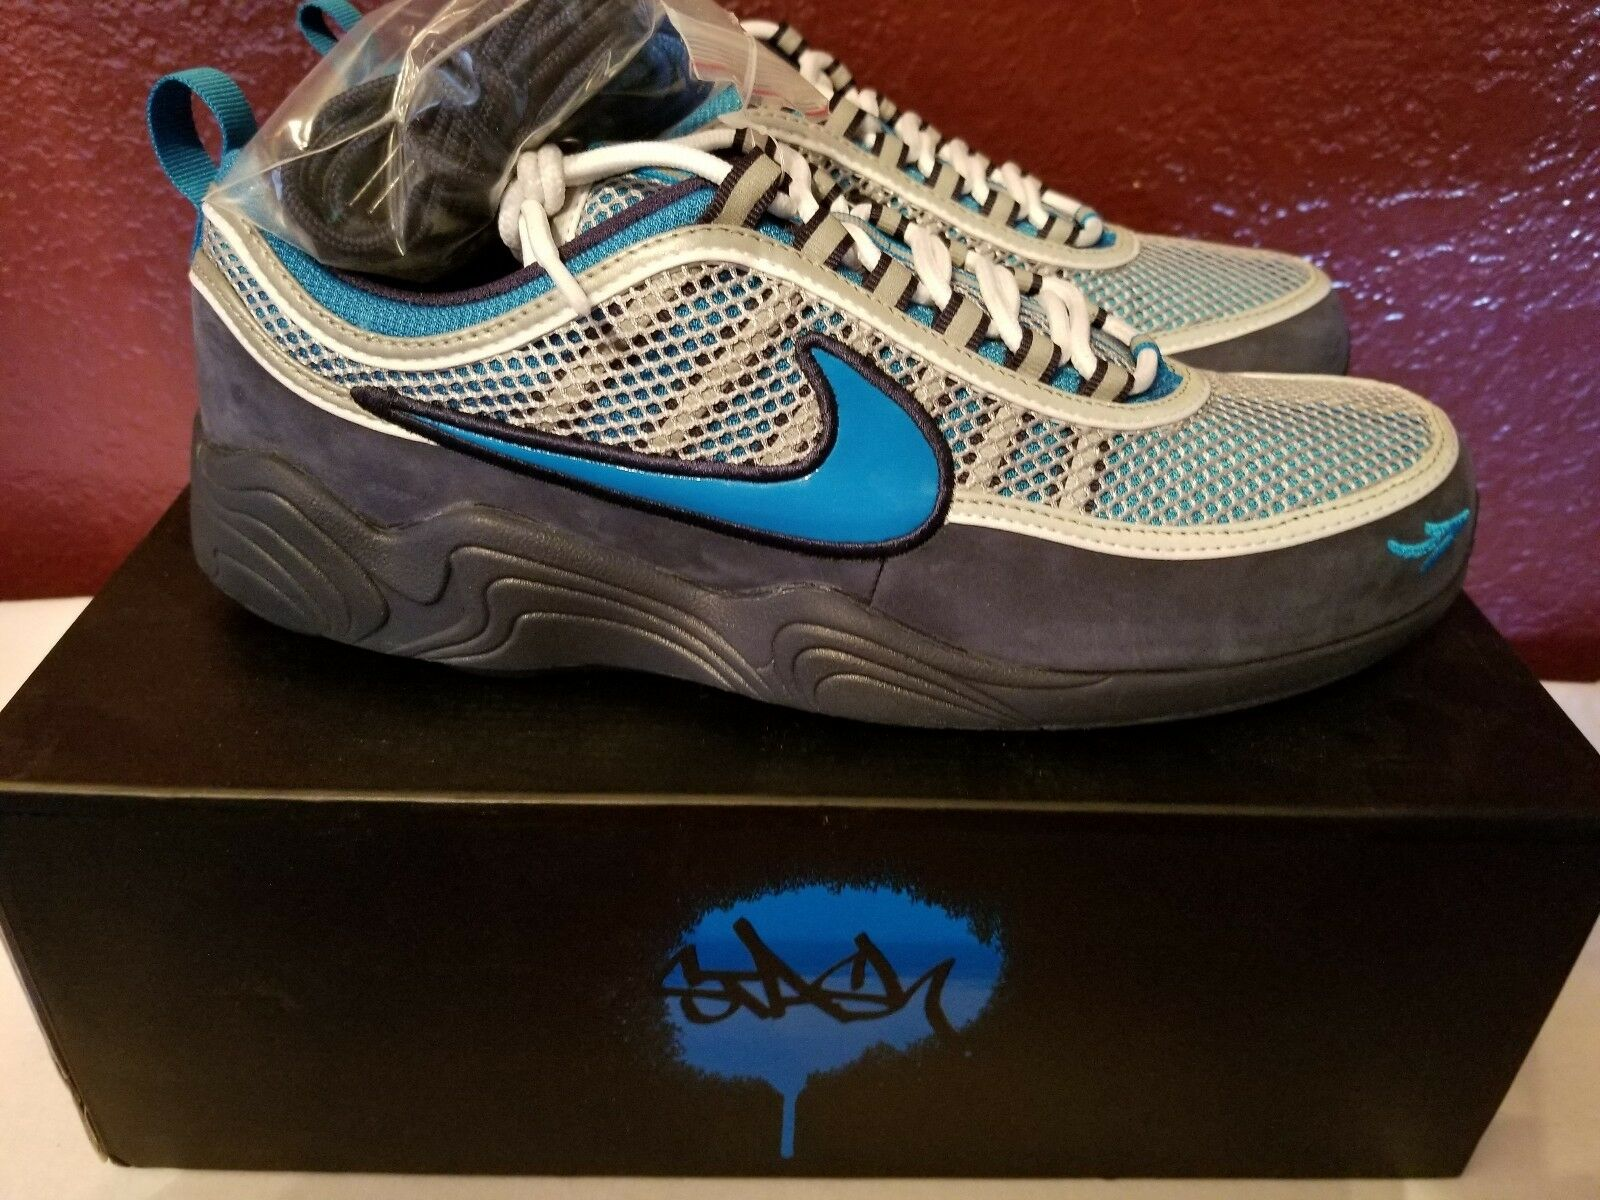 Nike STASH spiridon Sz 11